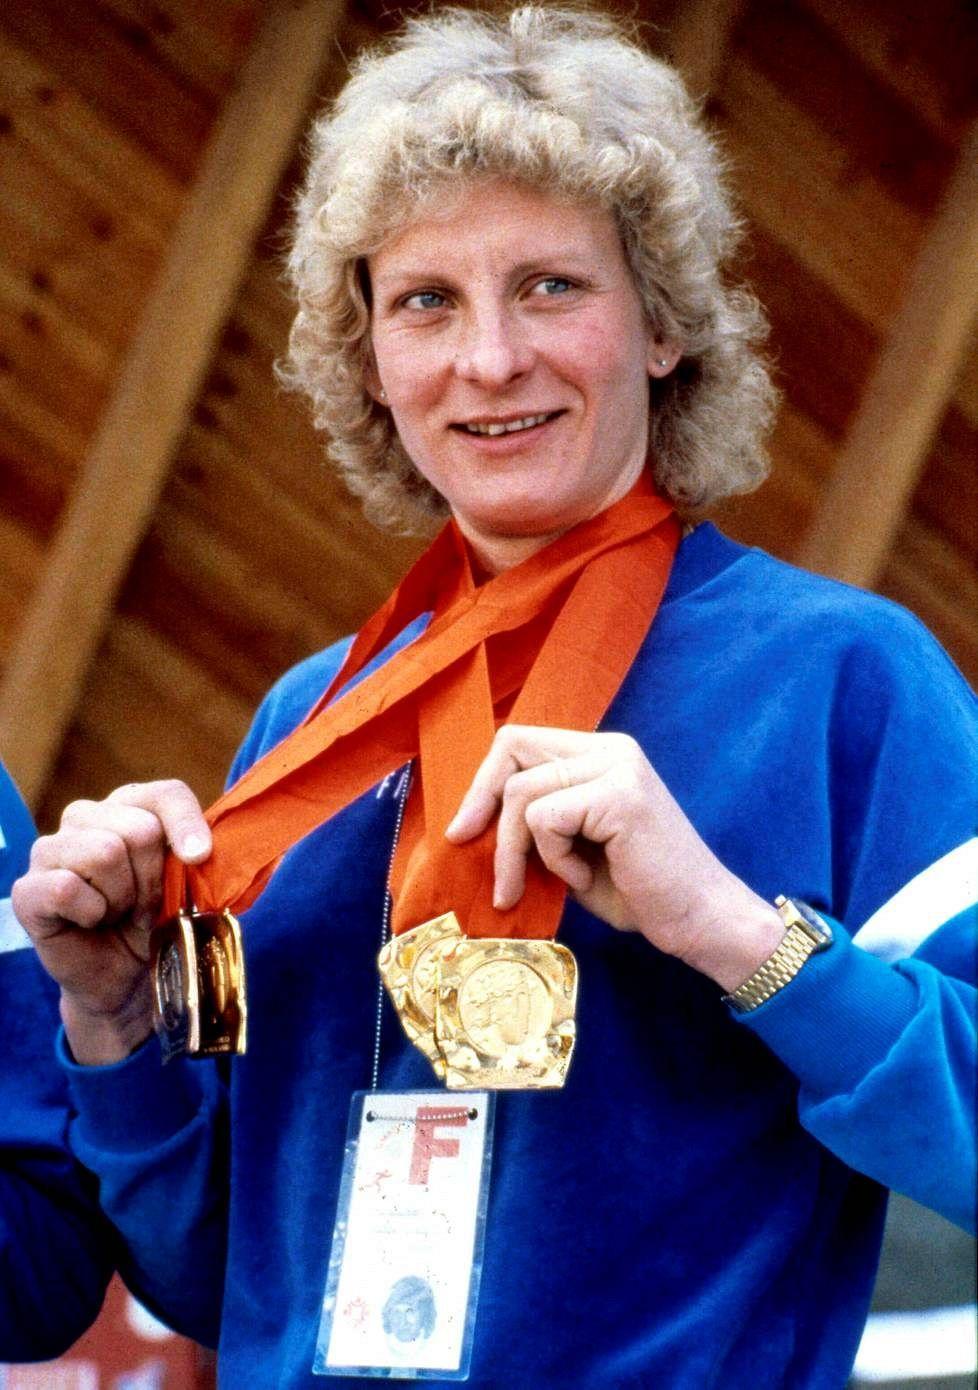 Marja-Liisa Kirvesniemi 7 Olympic medals